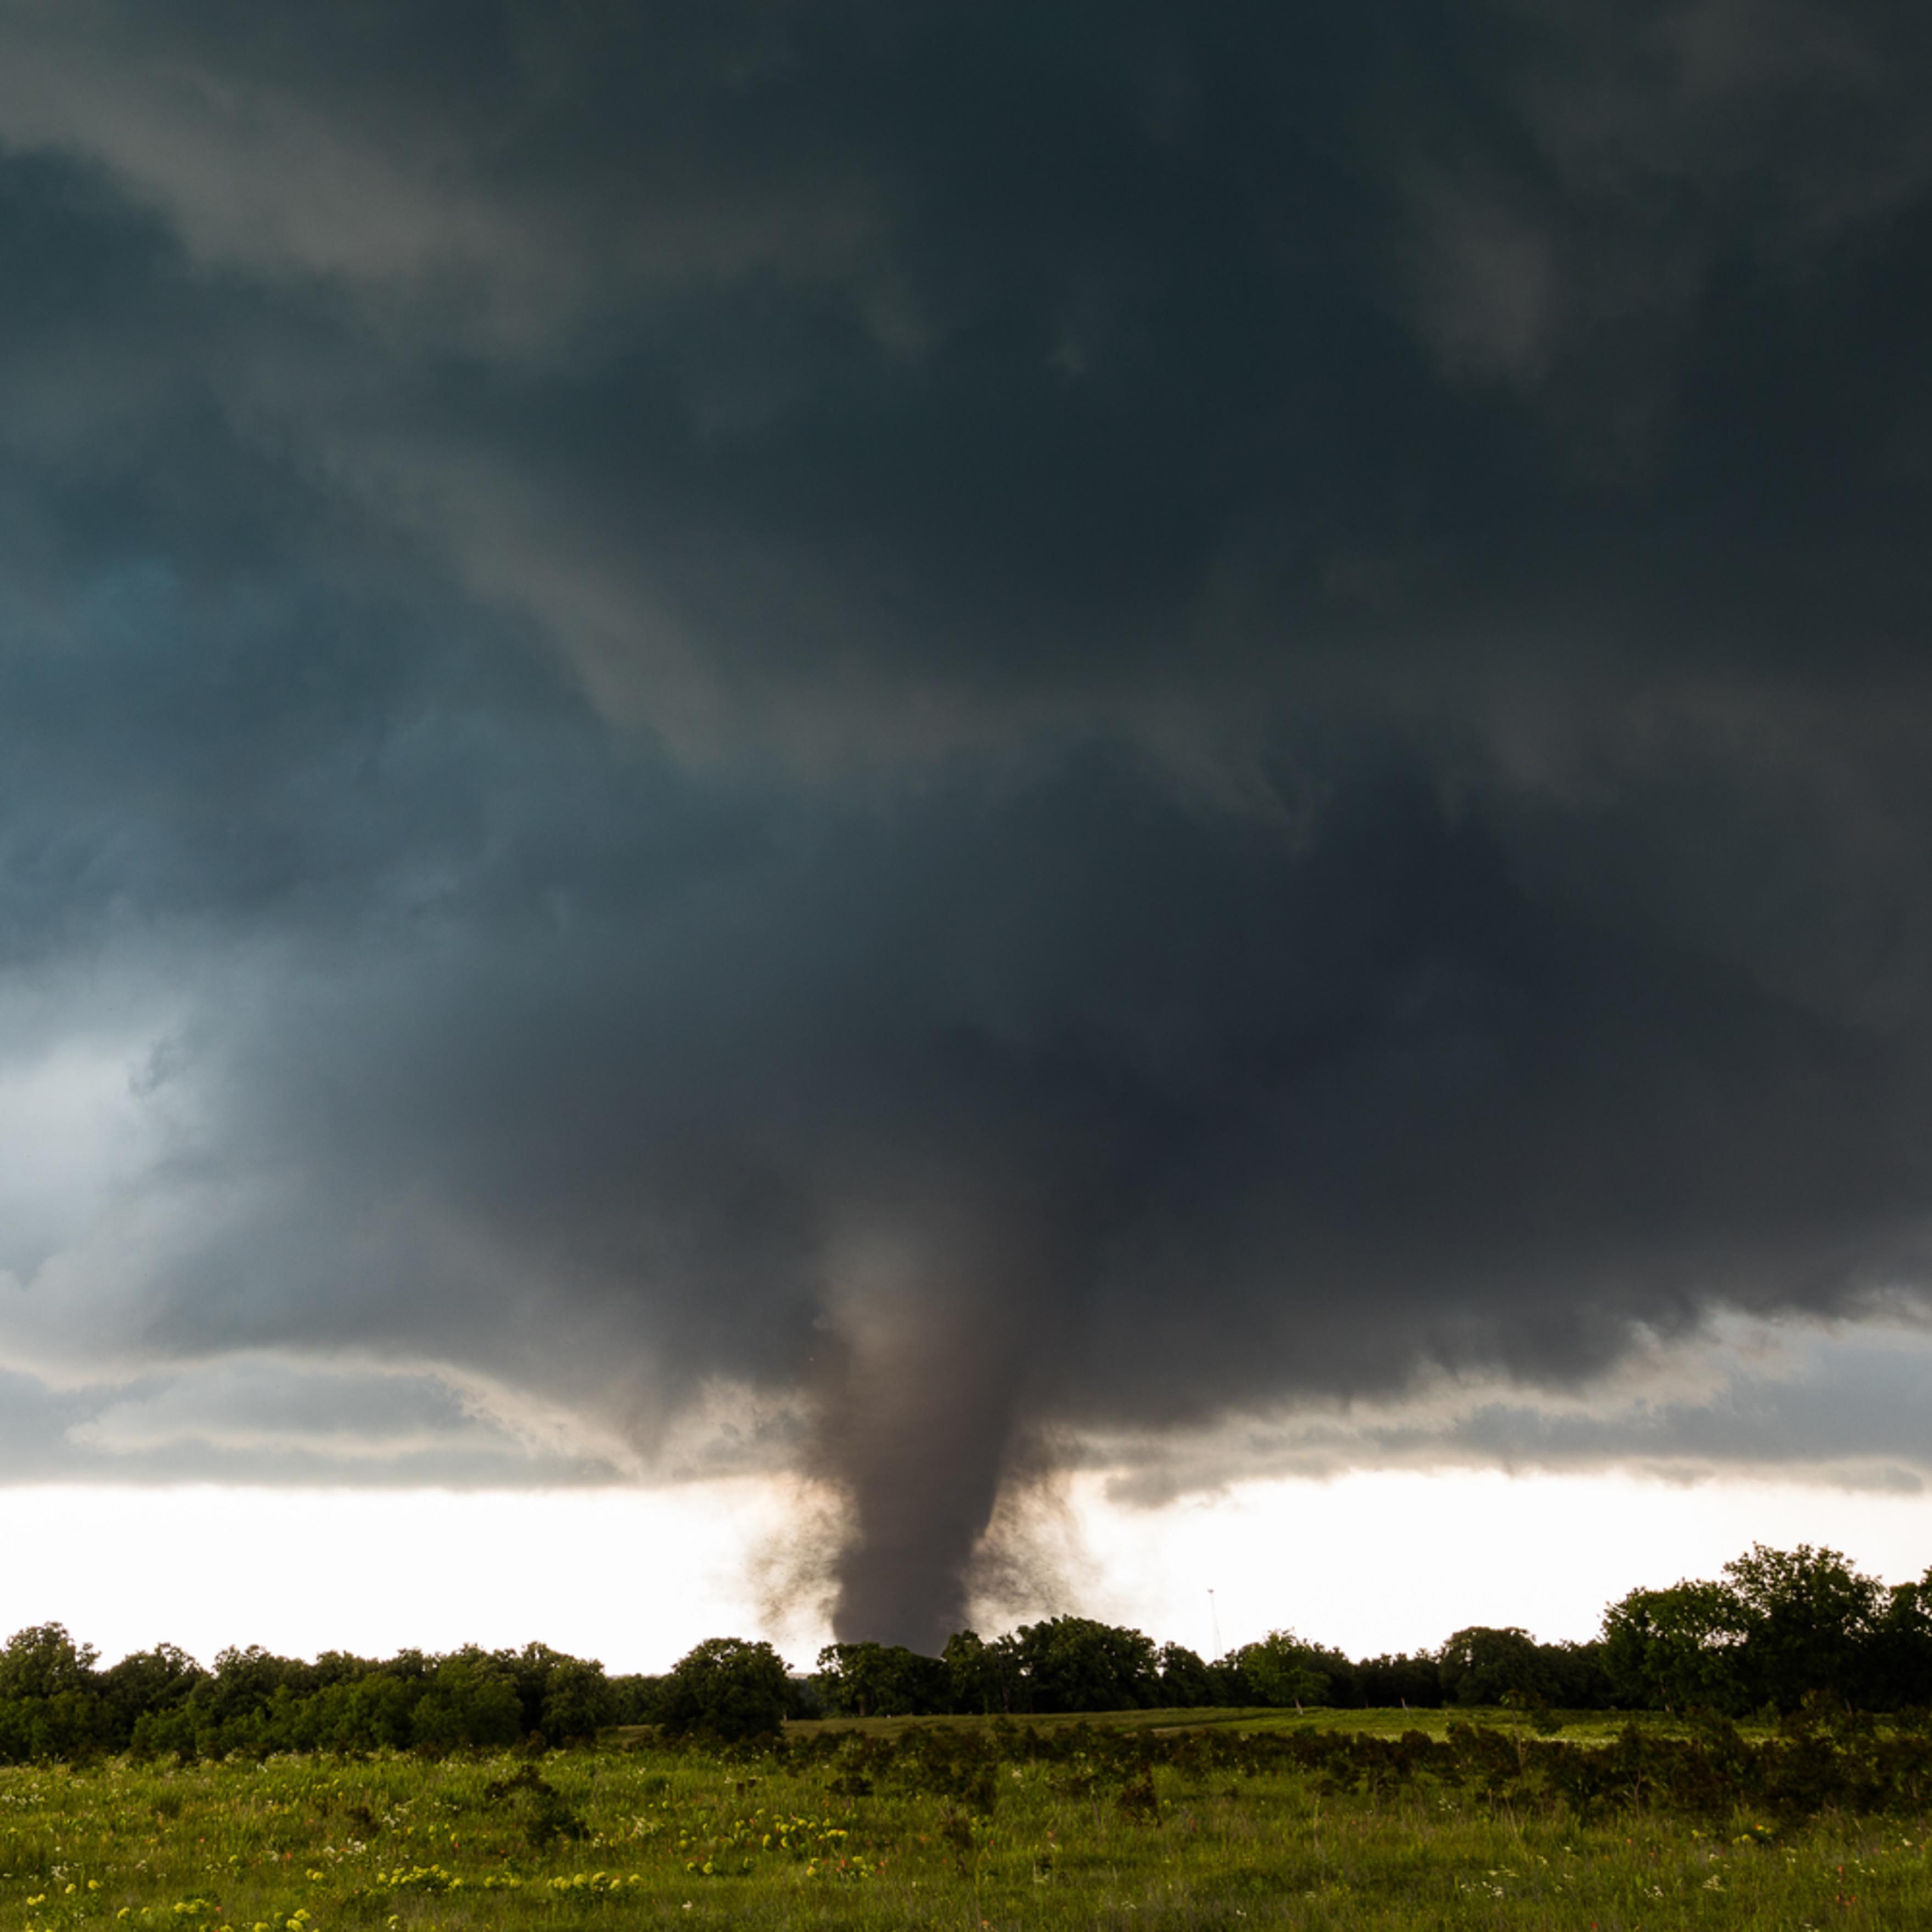 20160509 tornado 01 11mm 8k 0188 edit kvybnk